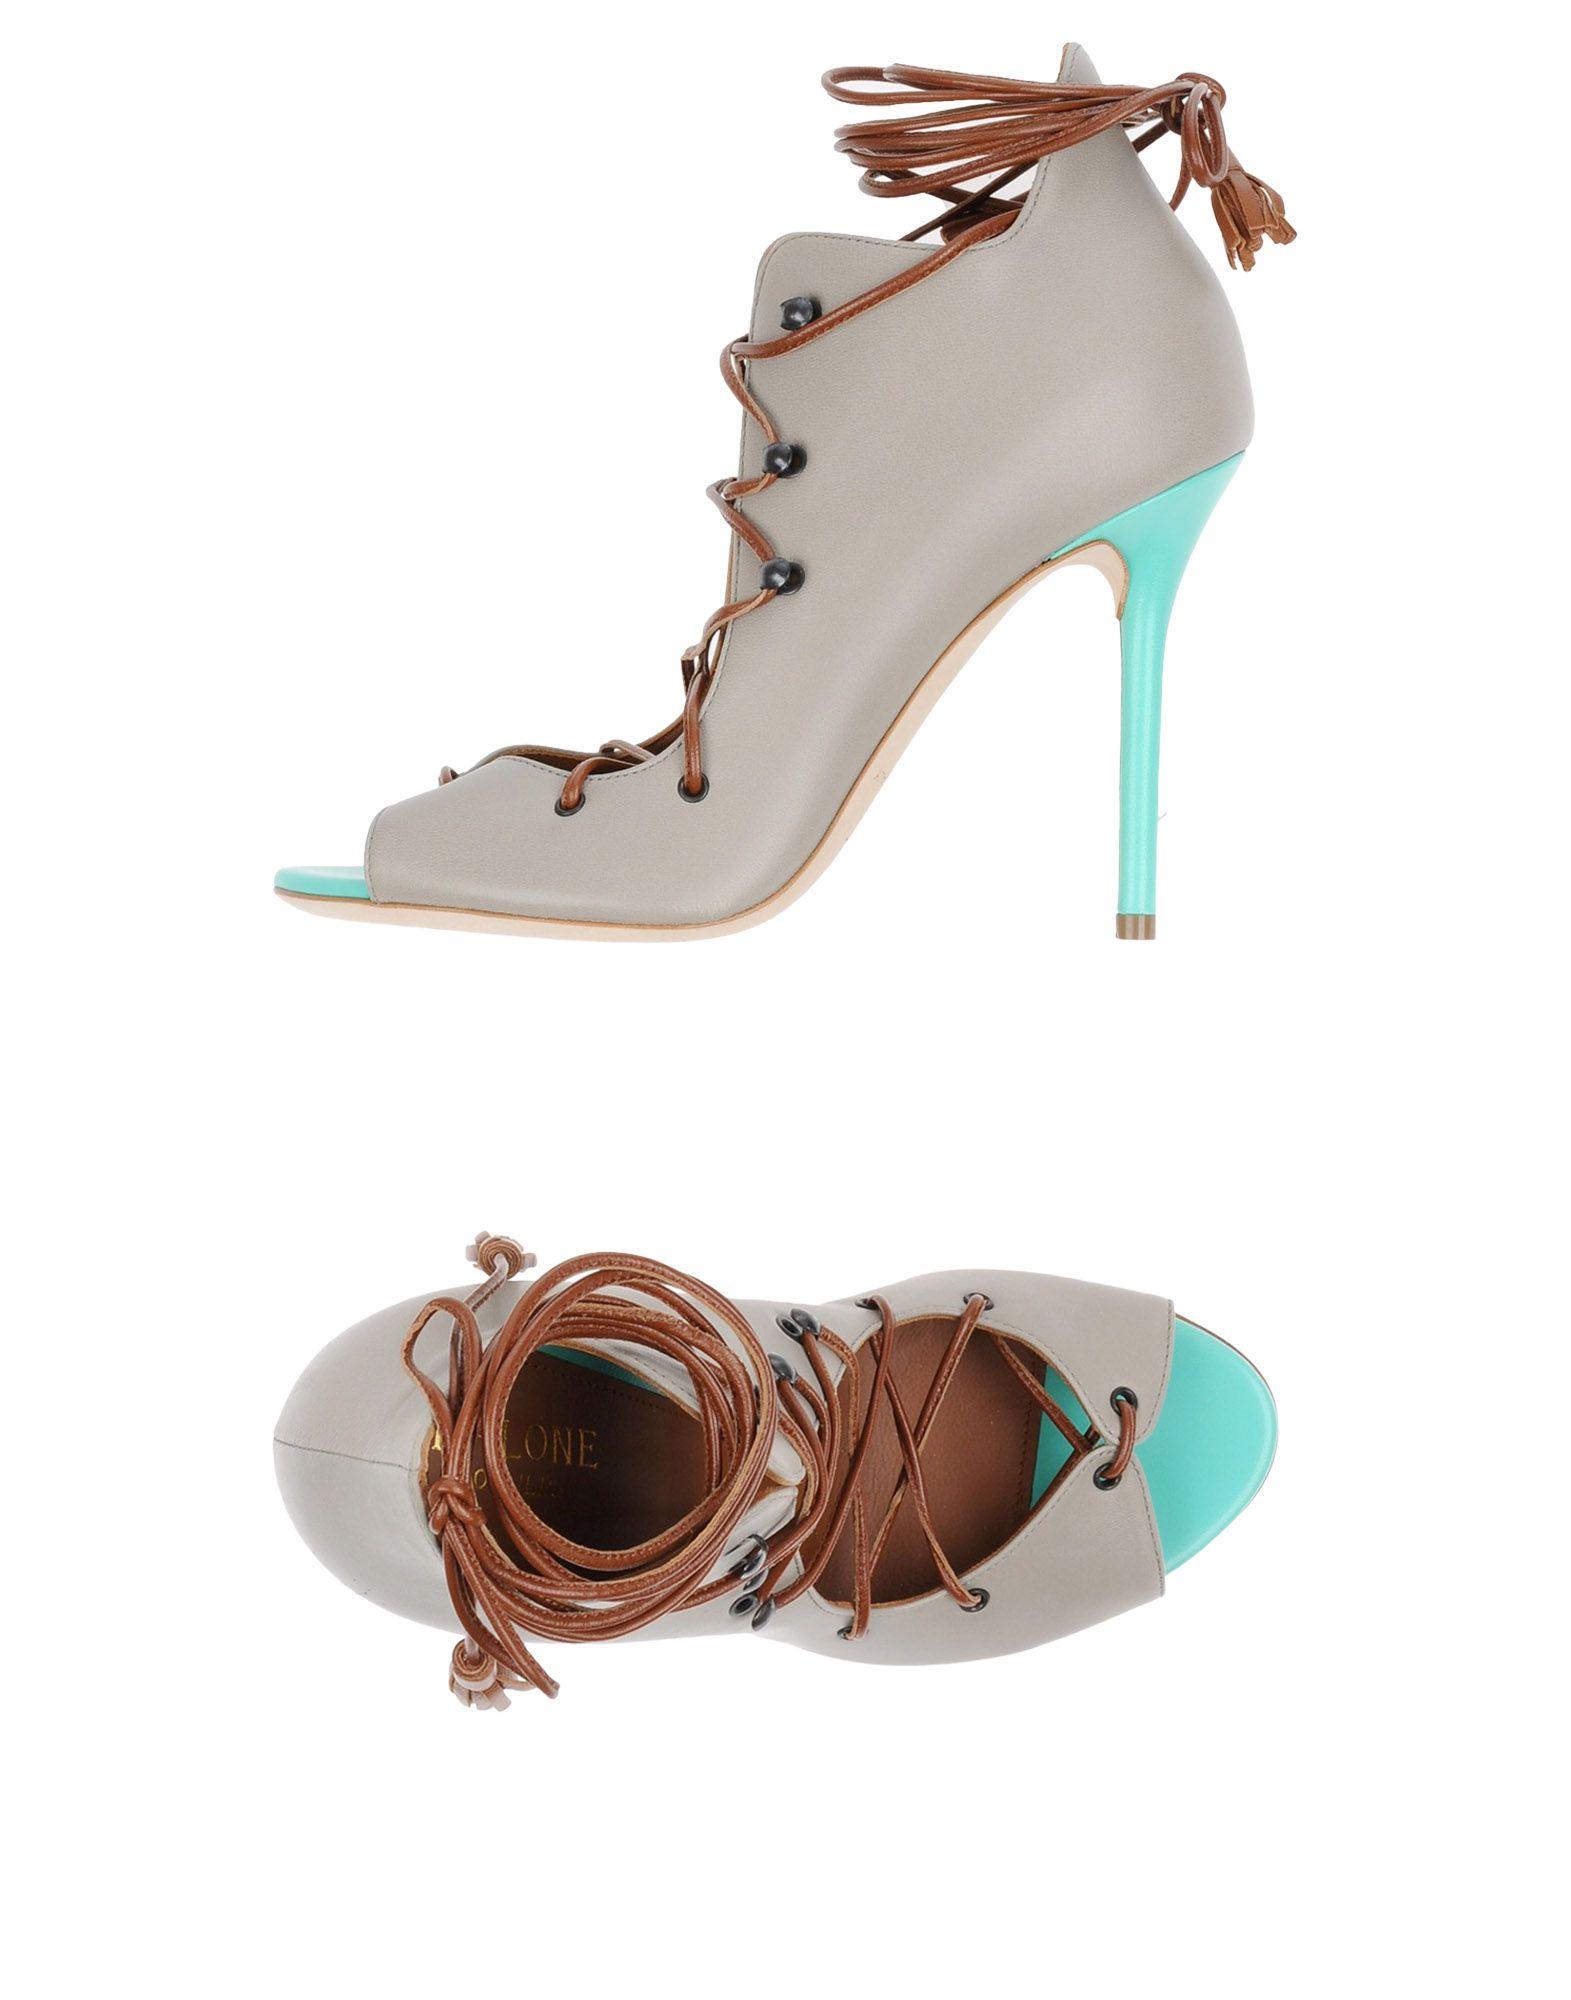 Malone Souliers Schnürschuhe aussehende Damen  11247640KAGünstige gut aussehende Schnürschuhe Schuhe c16f1f